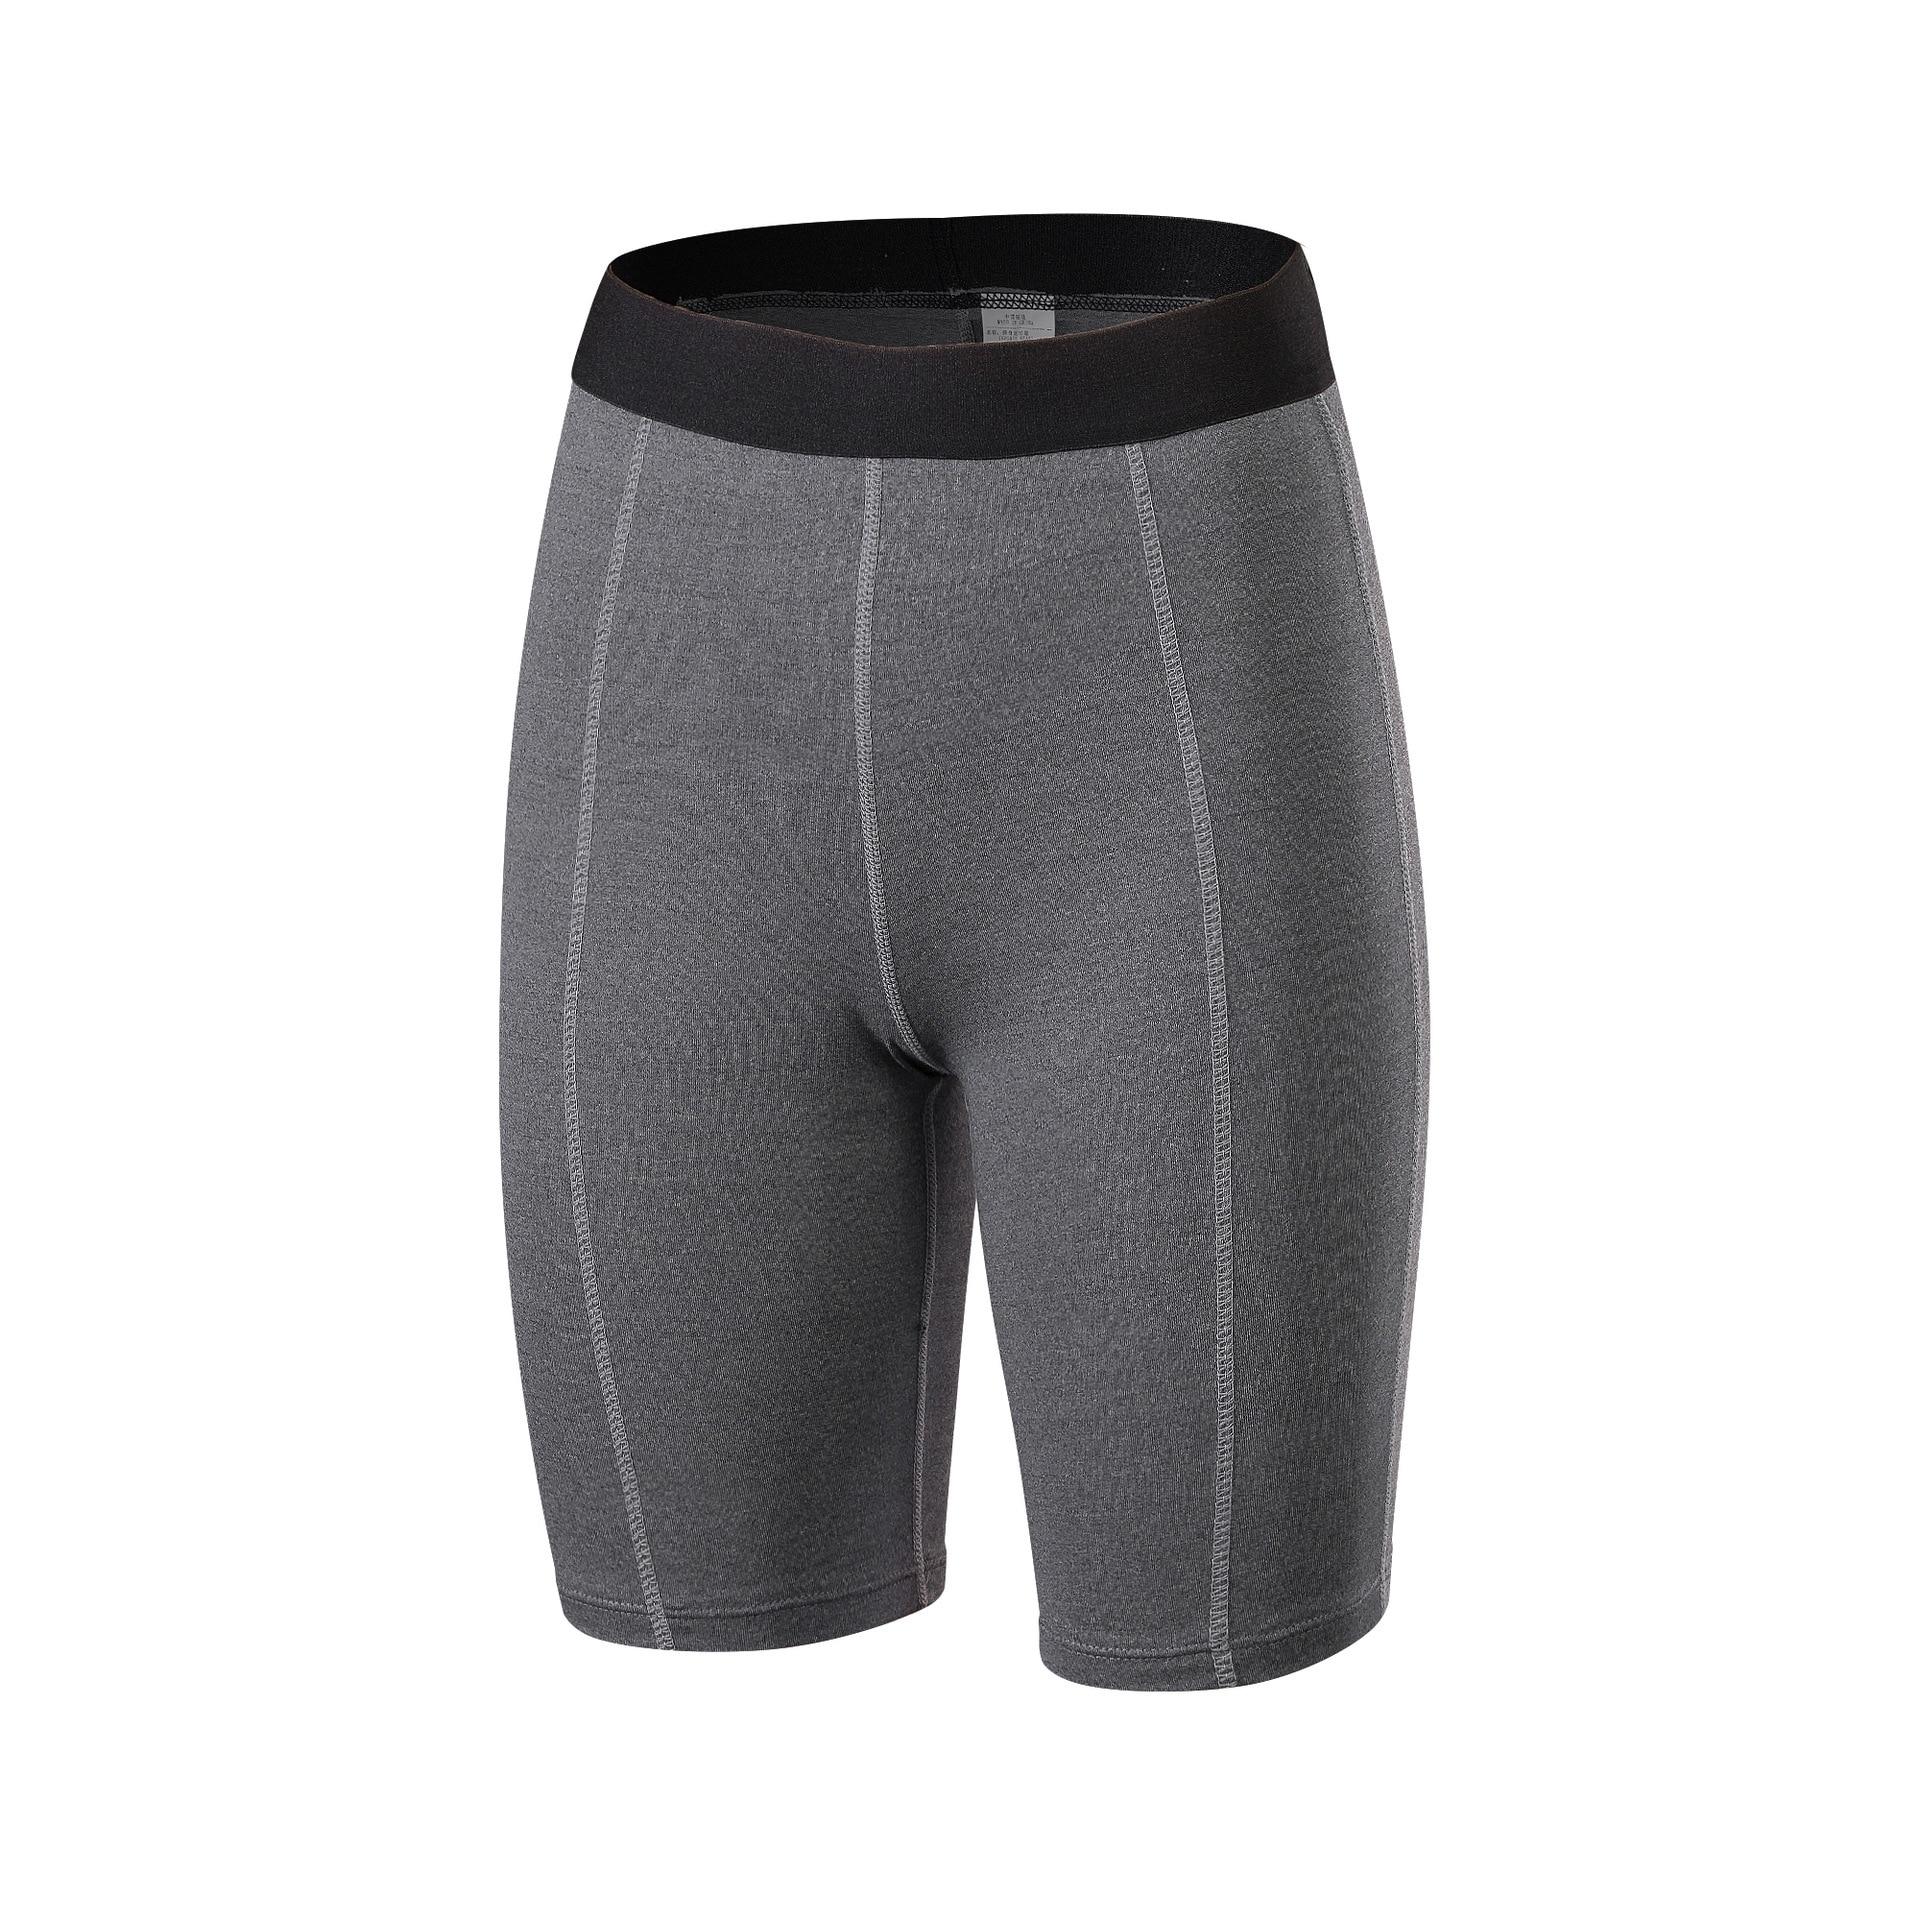 Women's Sports Leggings Shorts Outdoor Running Quick Drying Pants Fitness Yoga Shorts Leggings Training Shorts